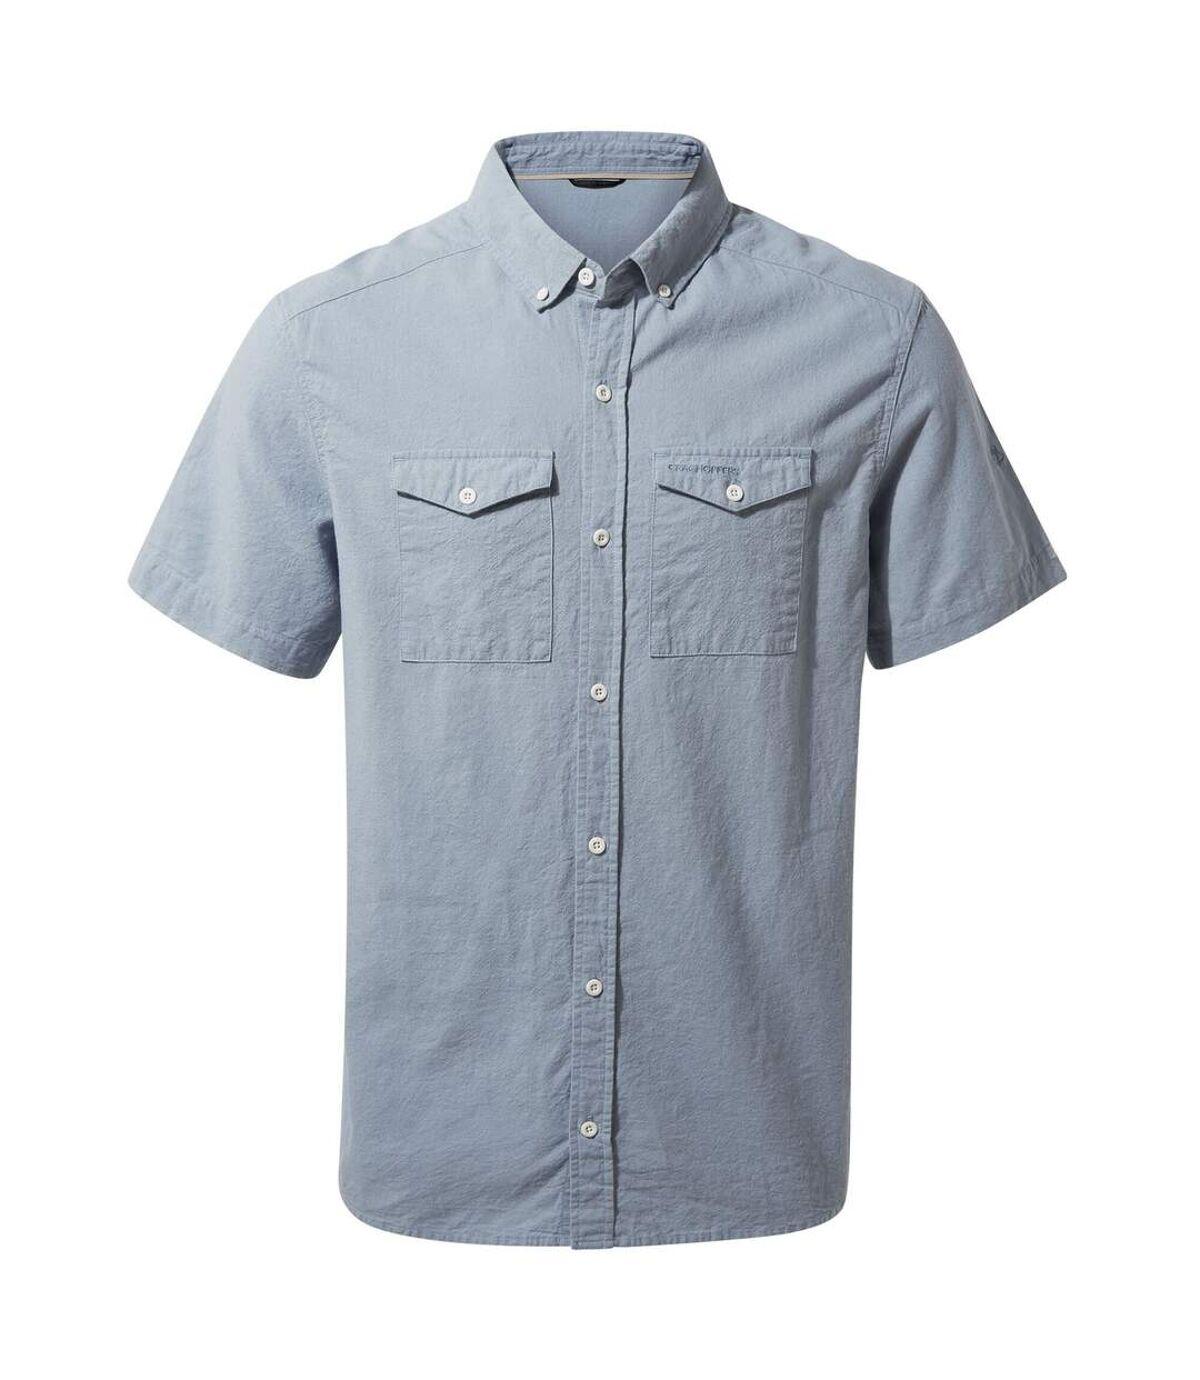 Craghoppers Mens Kiwi Linen Short Sleeved Shirt (Fogle Blue) - UTCG1345